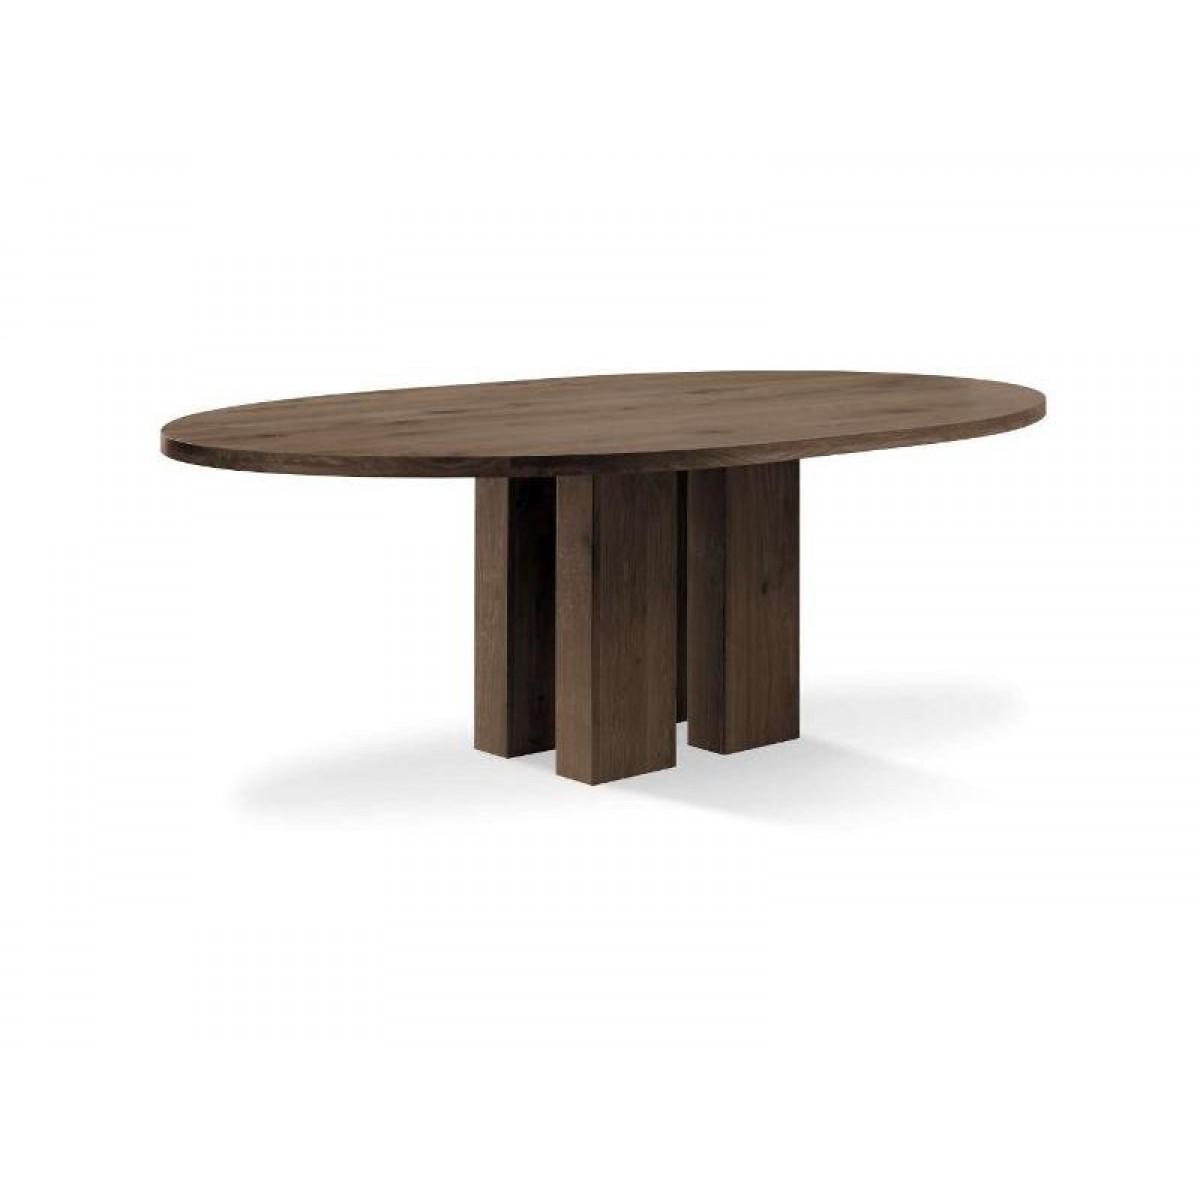 ovaal-ovale-tafel-eettafel-eetkamertafel-eiken-kolompoot